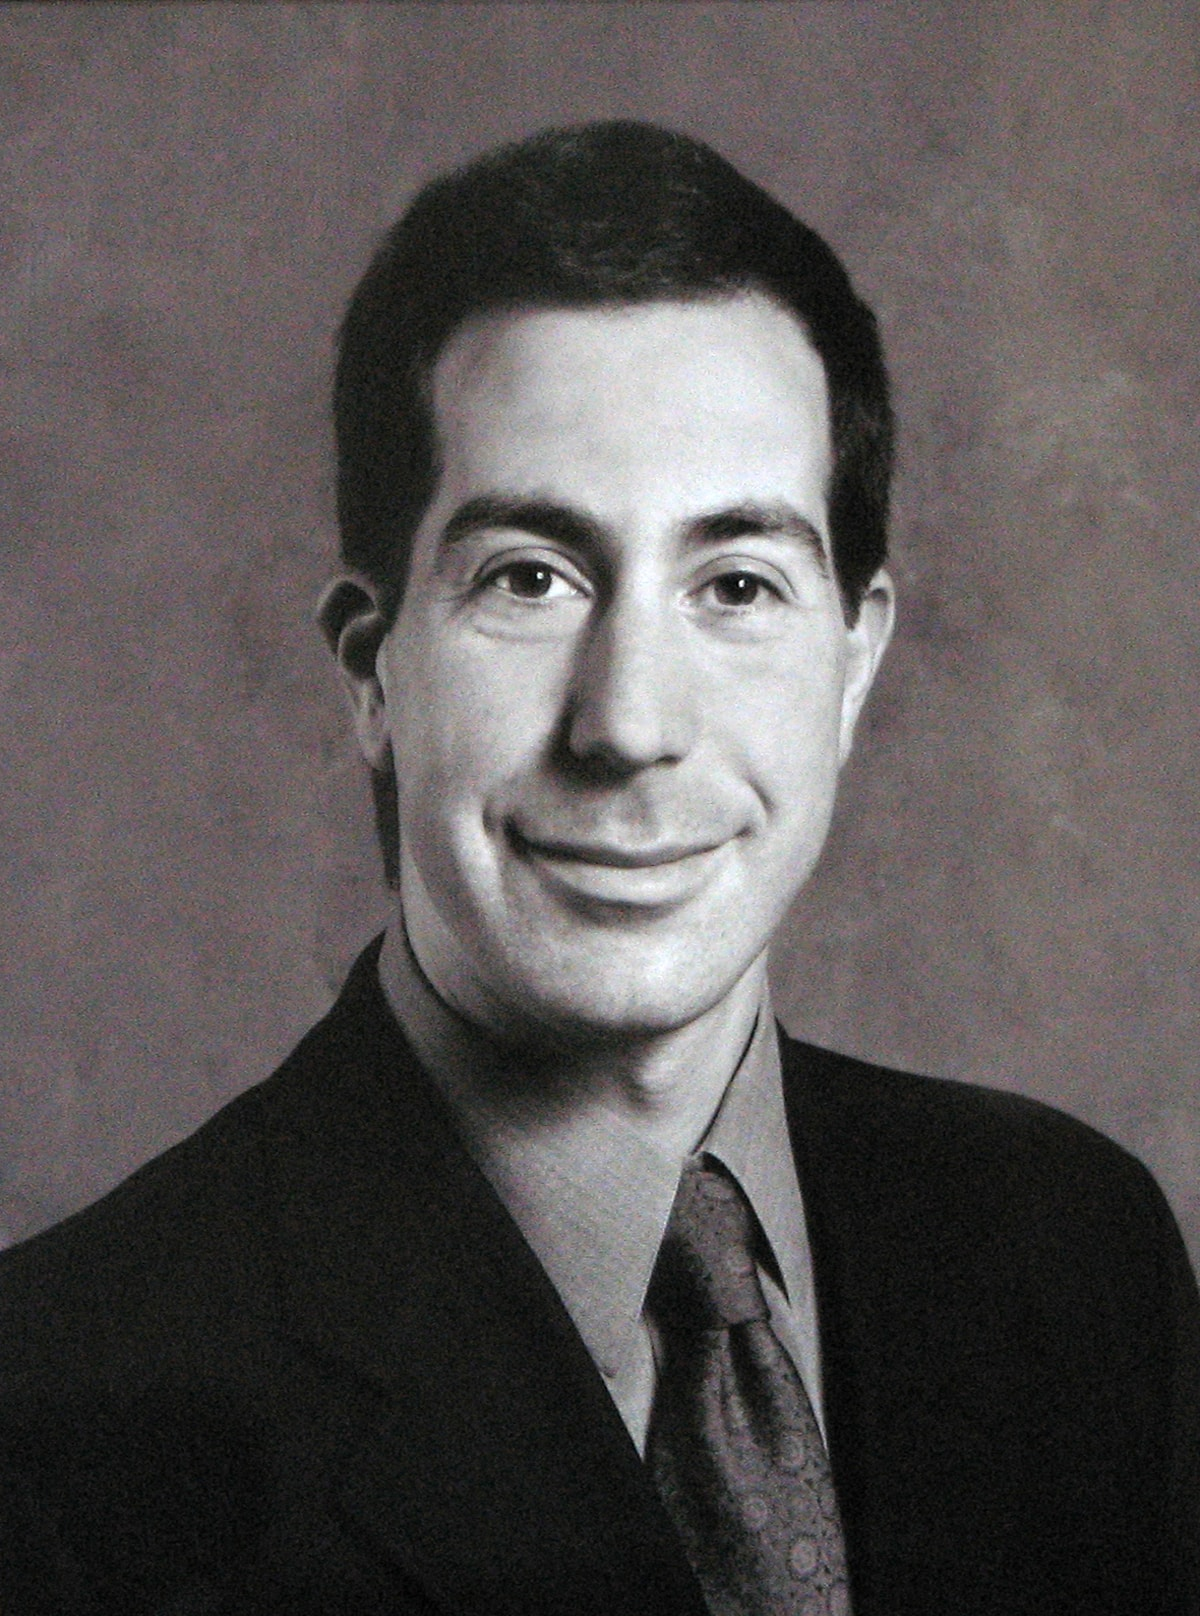 Mayor Anthony Housefather